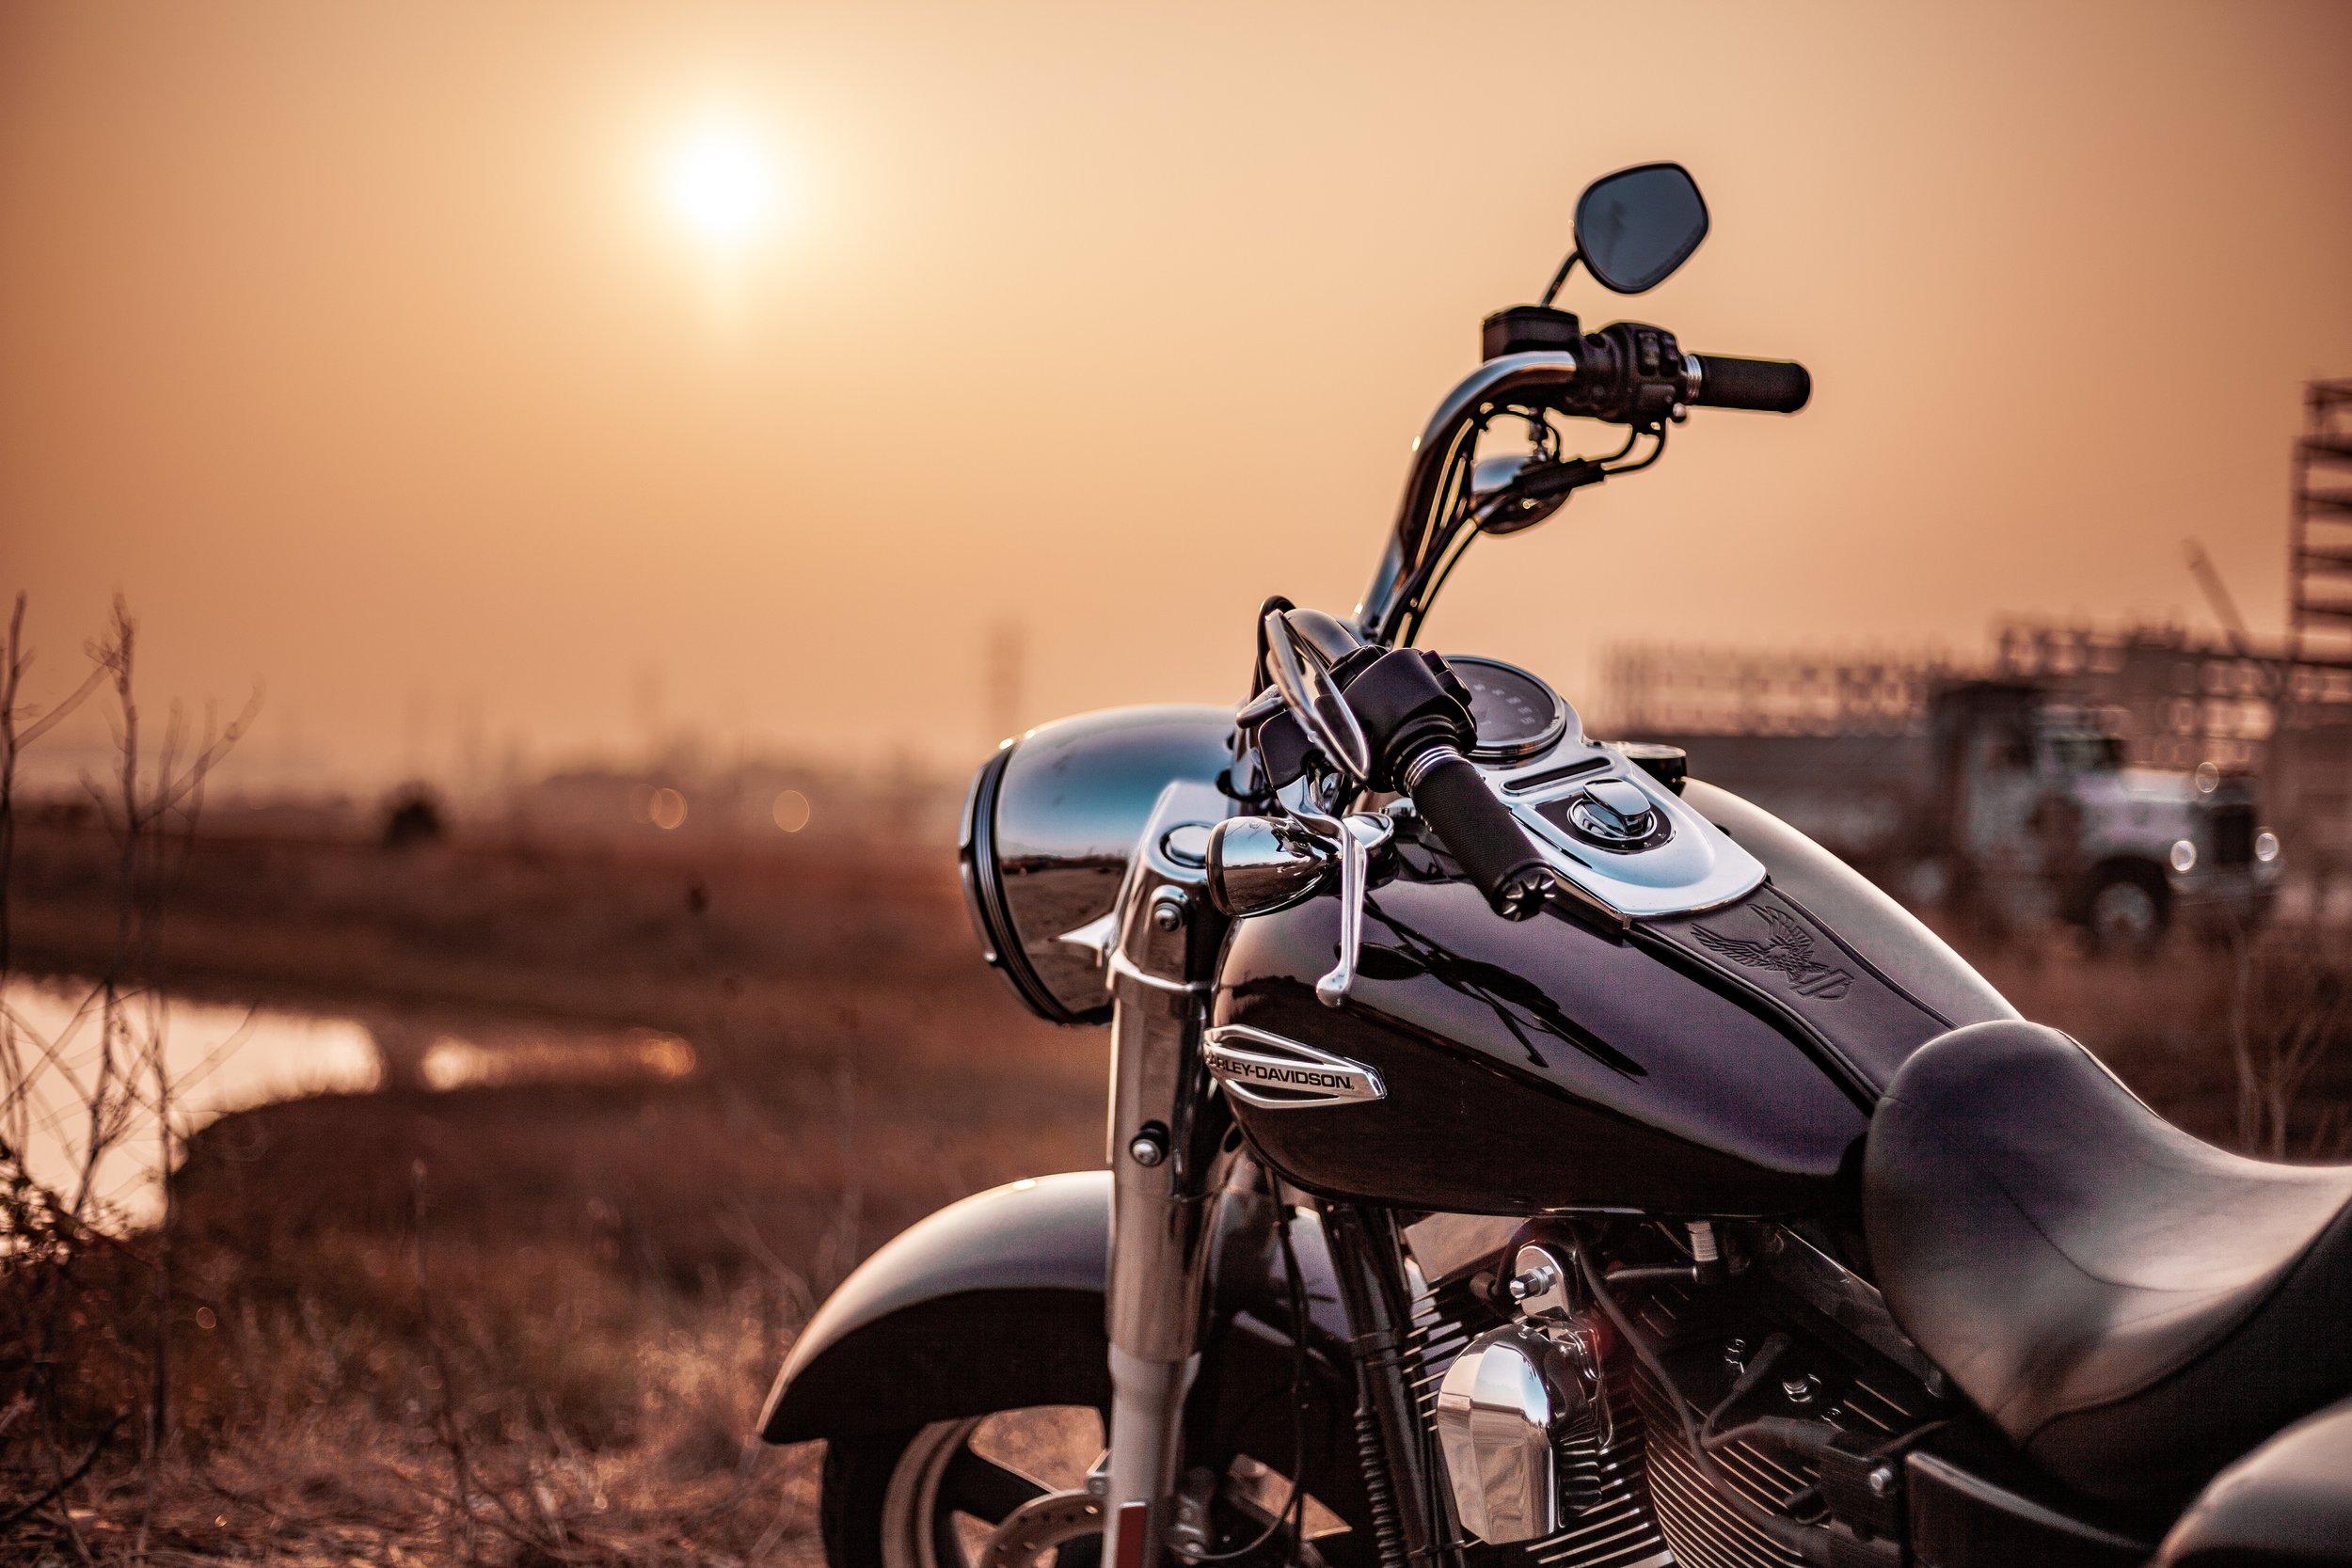 bike-dawn-dusk-2116475.jpg